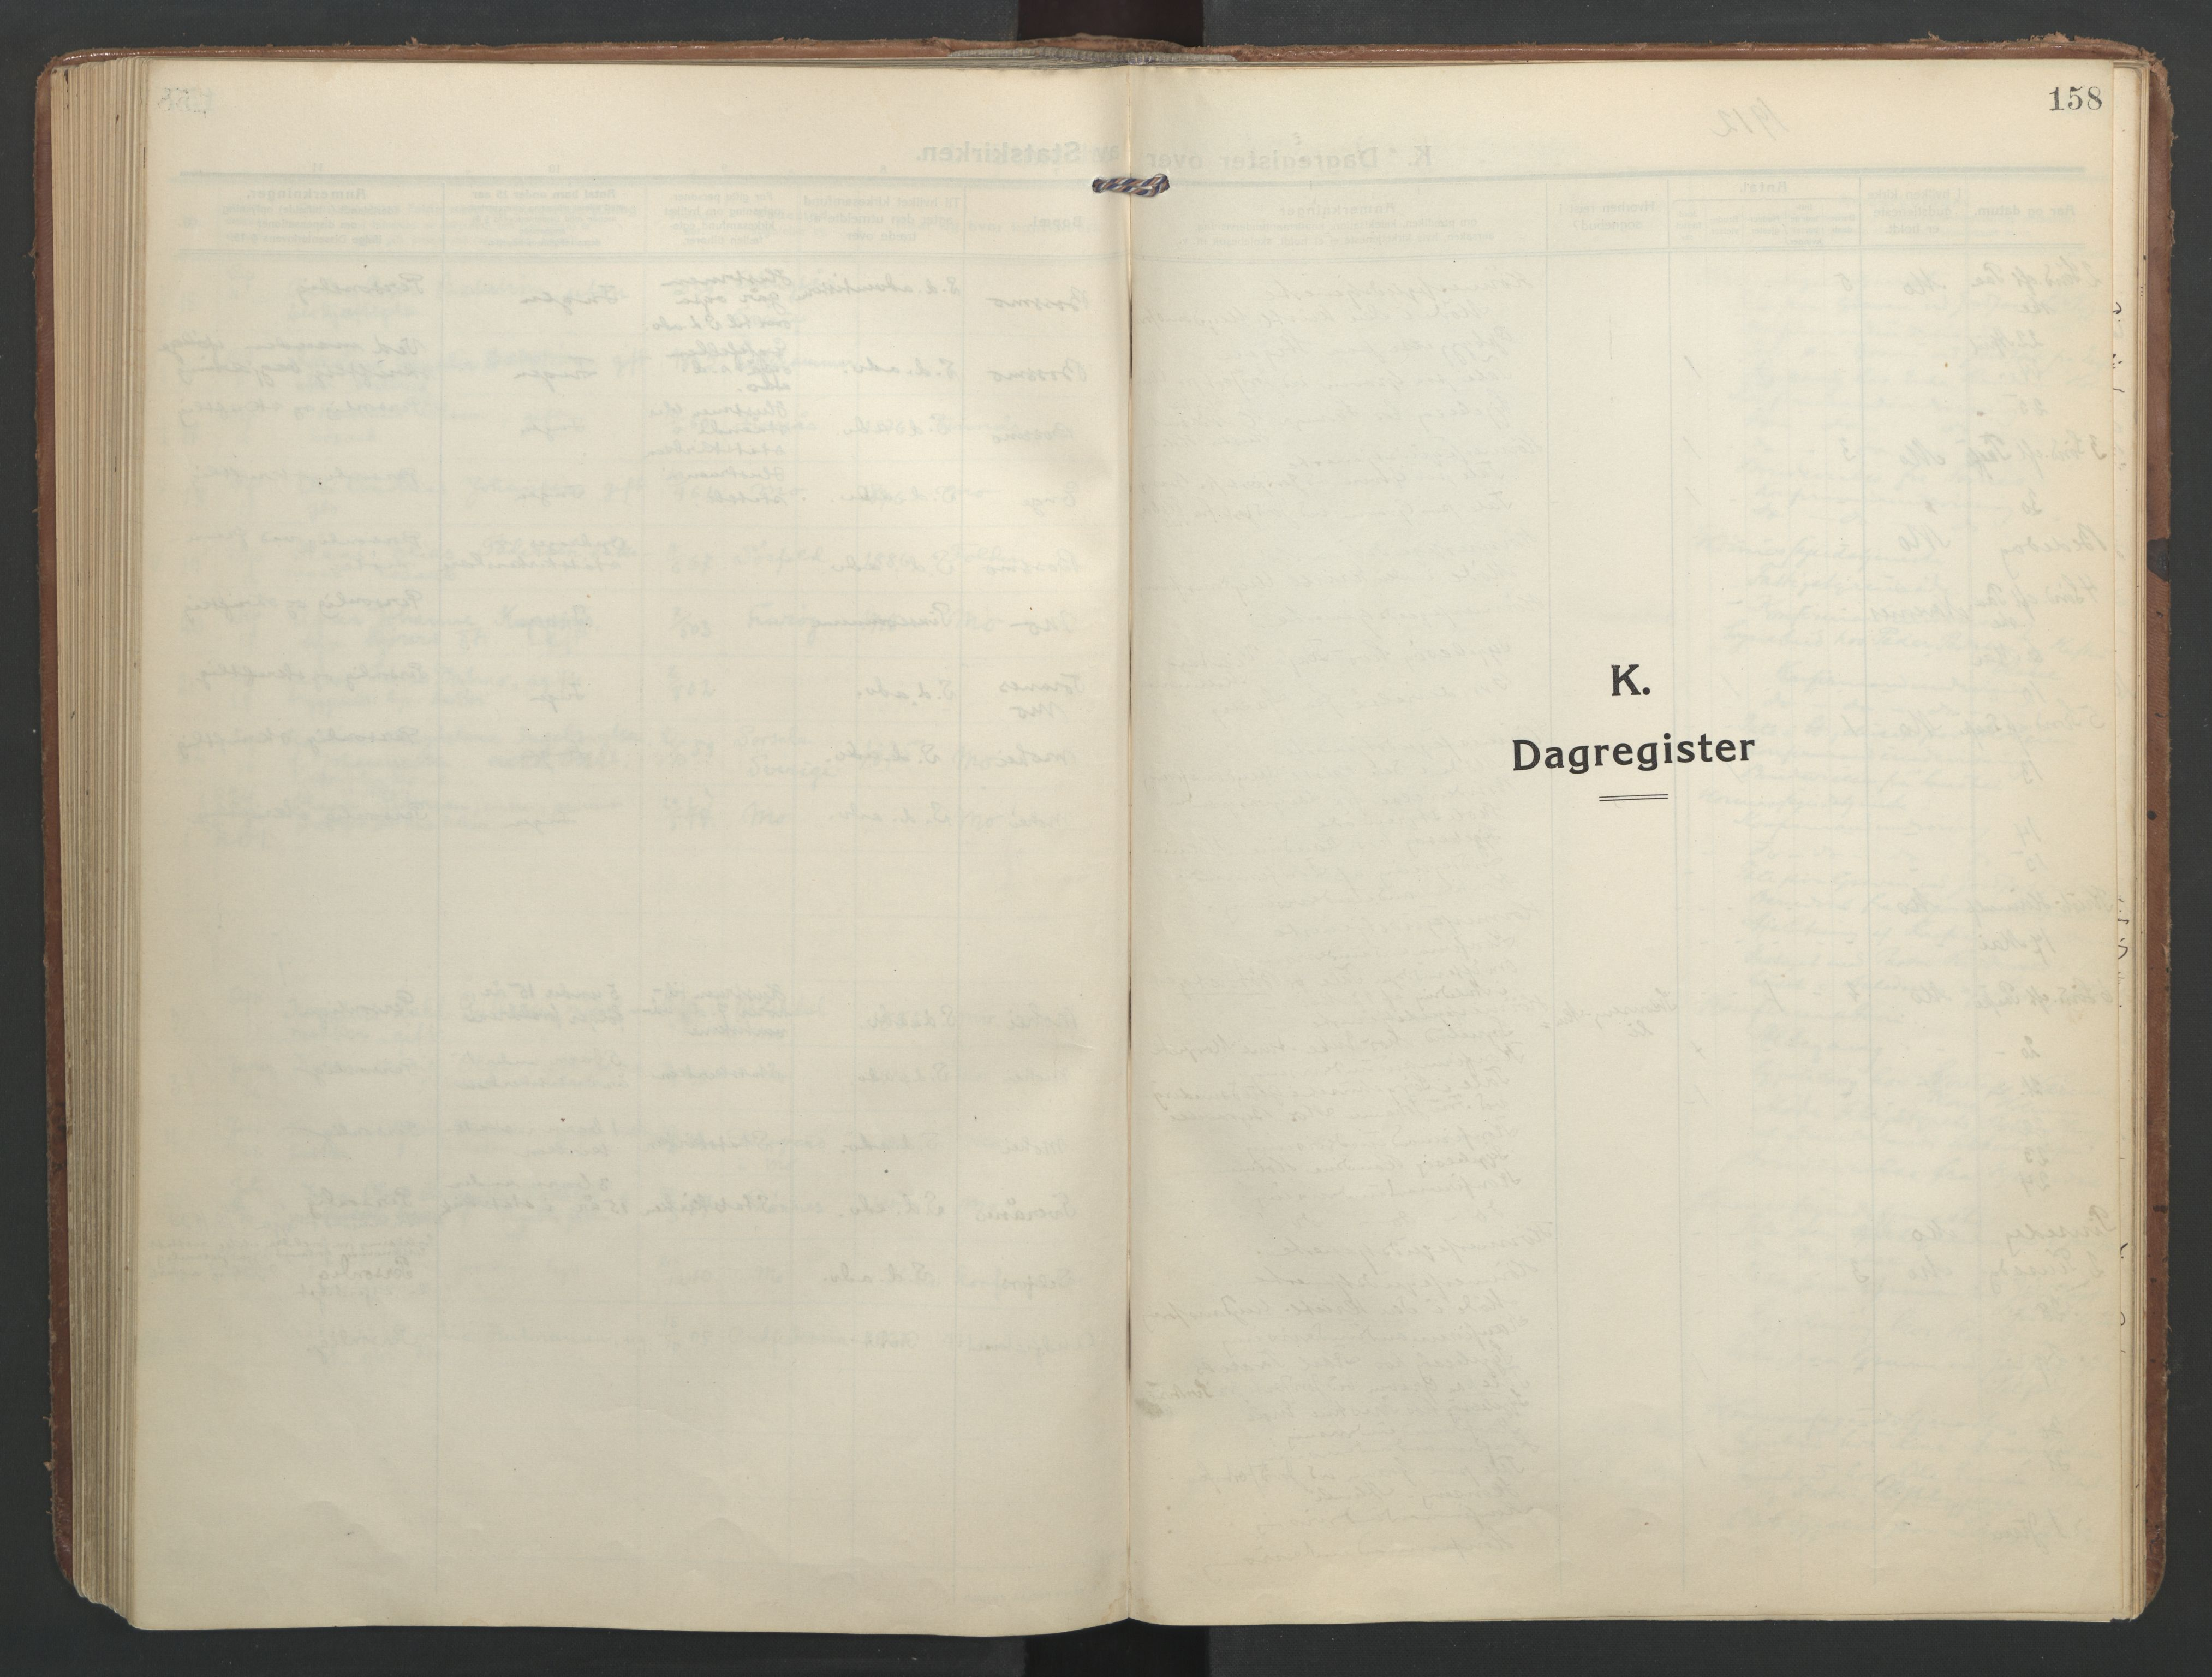 SAT, Ministerialprotokoller, klokkerbøker og fødselsregistre - Nordland, 827/L0405: Ministerialbok nr. 827A17, 1912-1925, s. 158